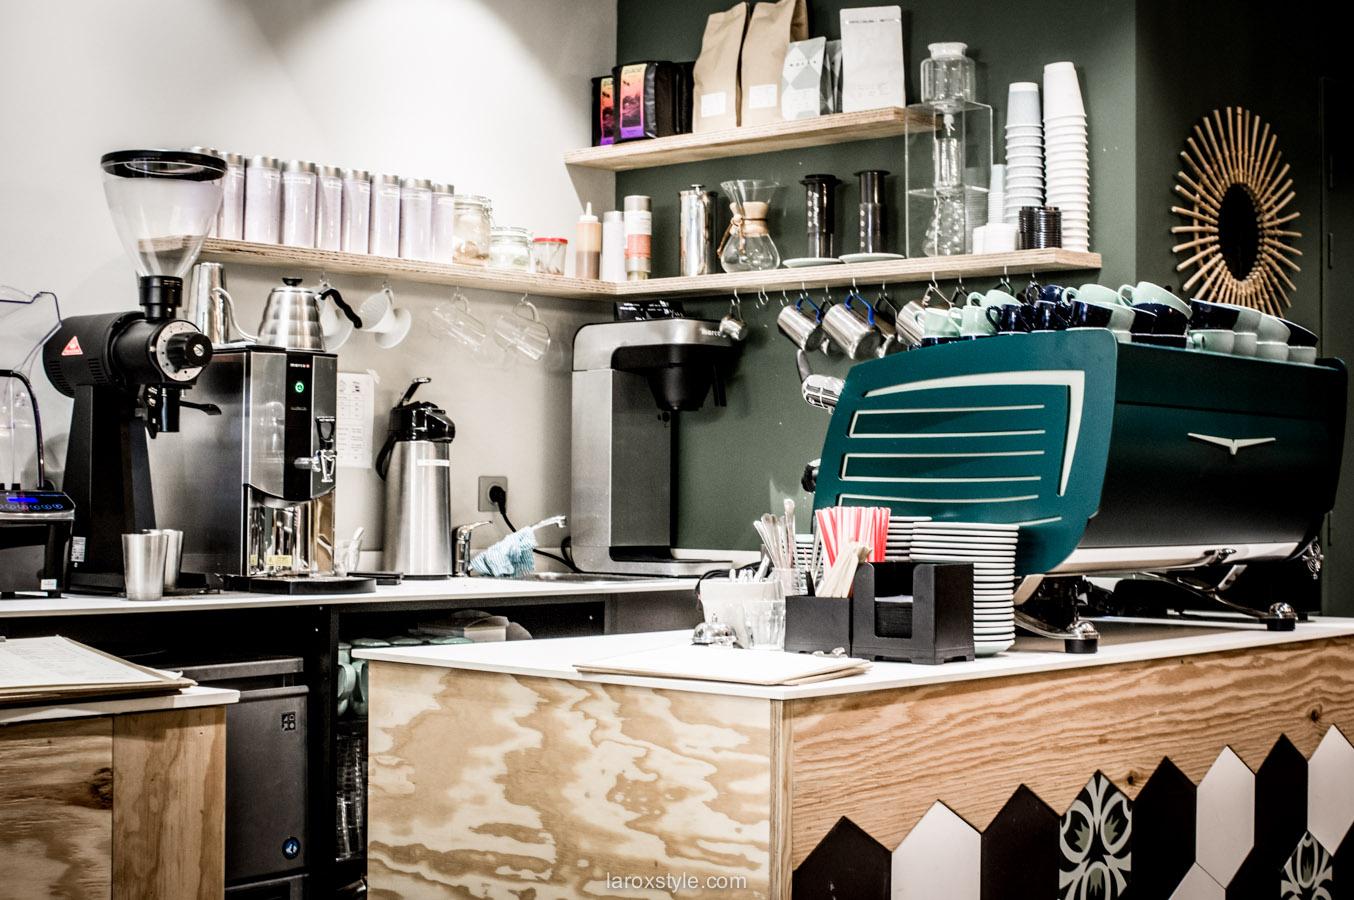 diploid - cafe lyon - blog lifestyle lyon - laroxstyle-5